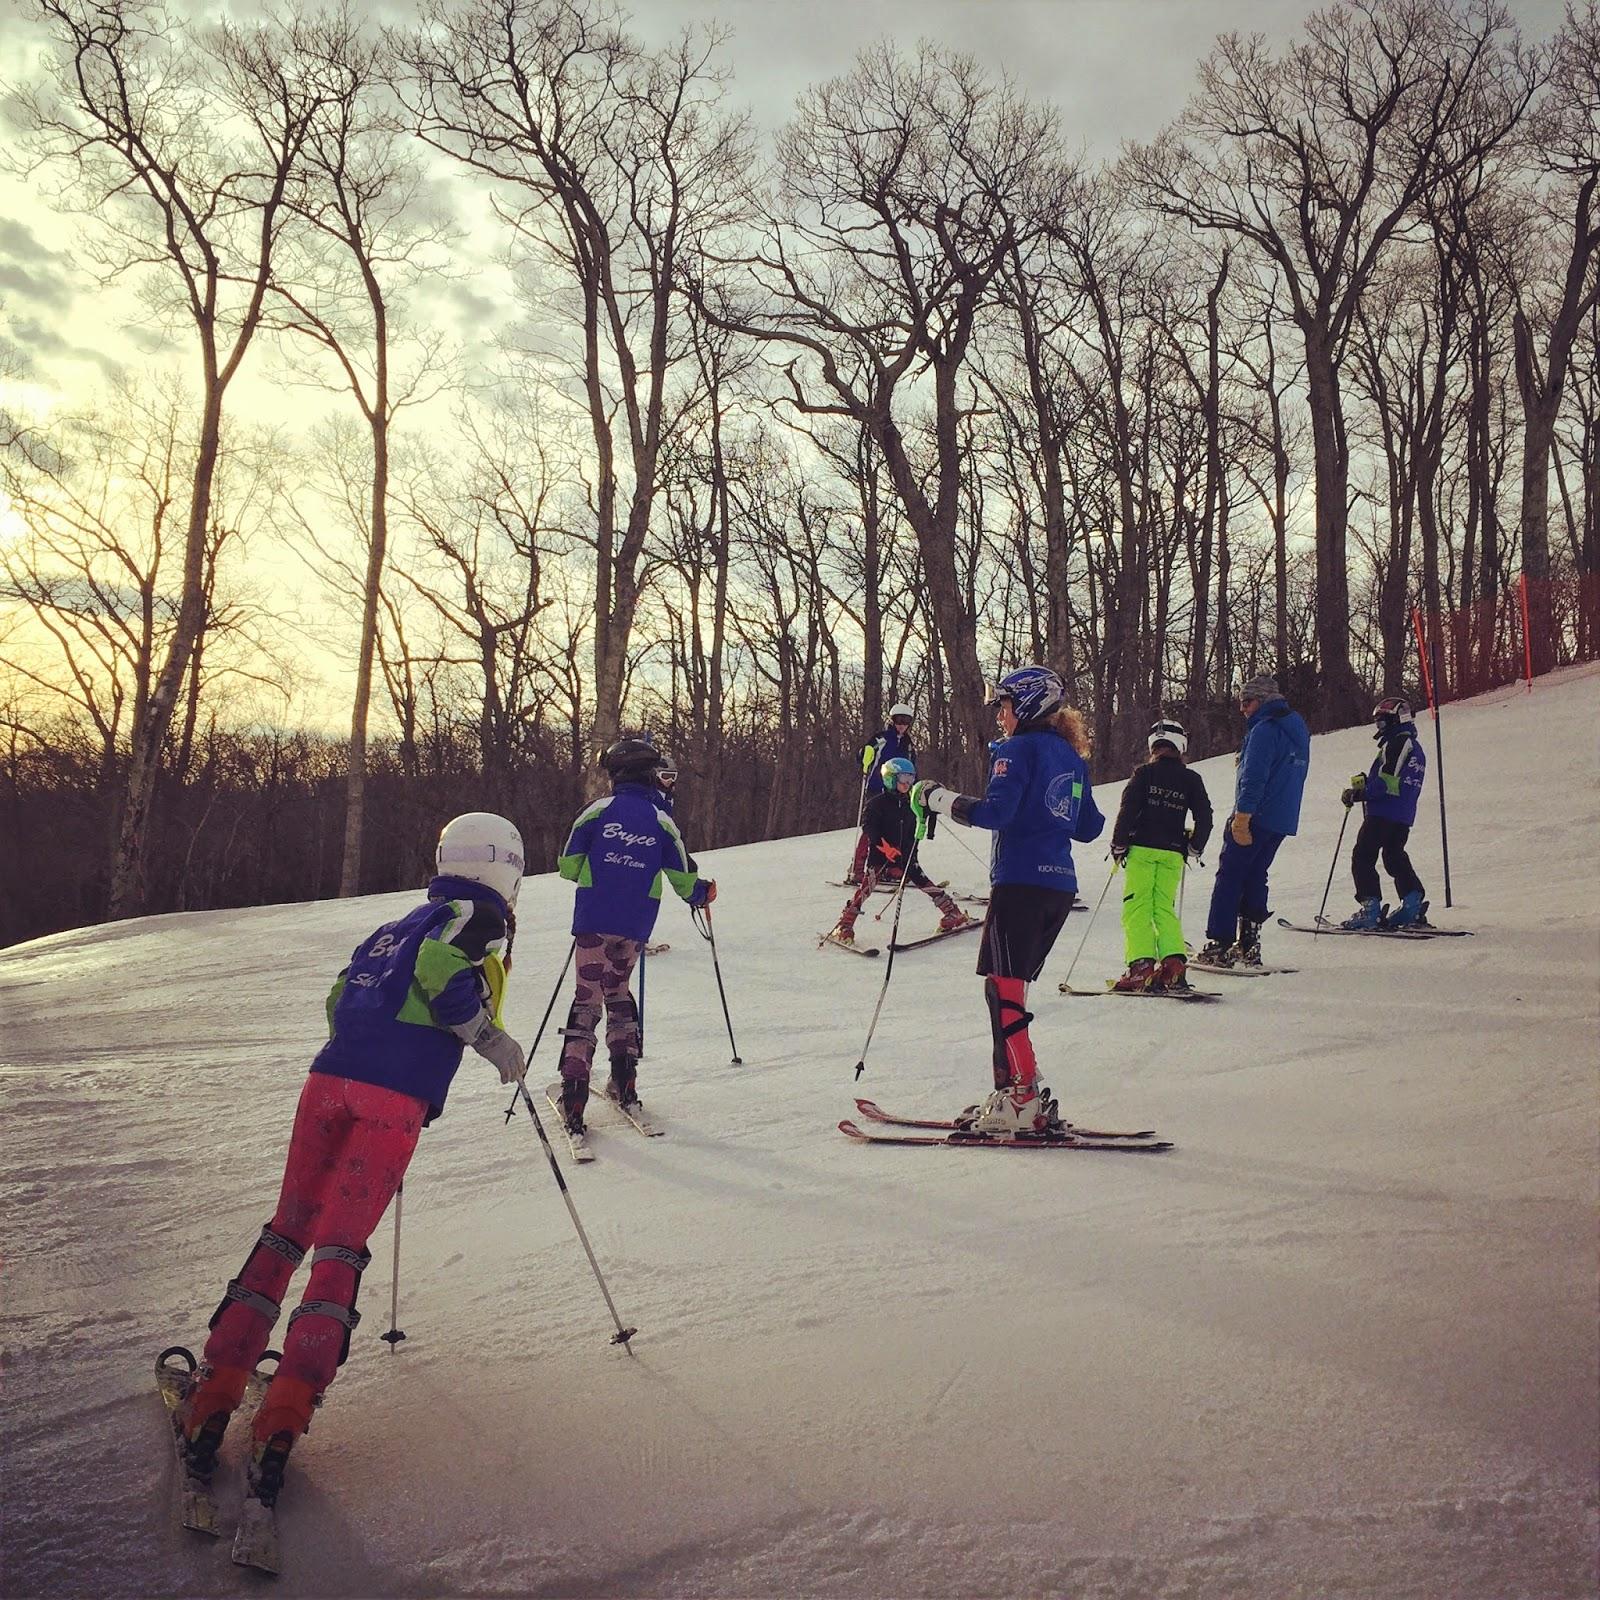 SARA, racing, wintergreen, ski, virginia